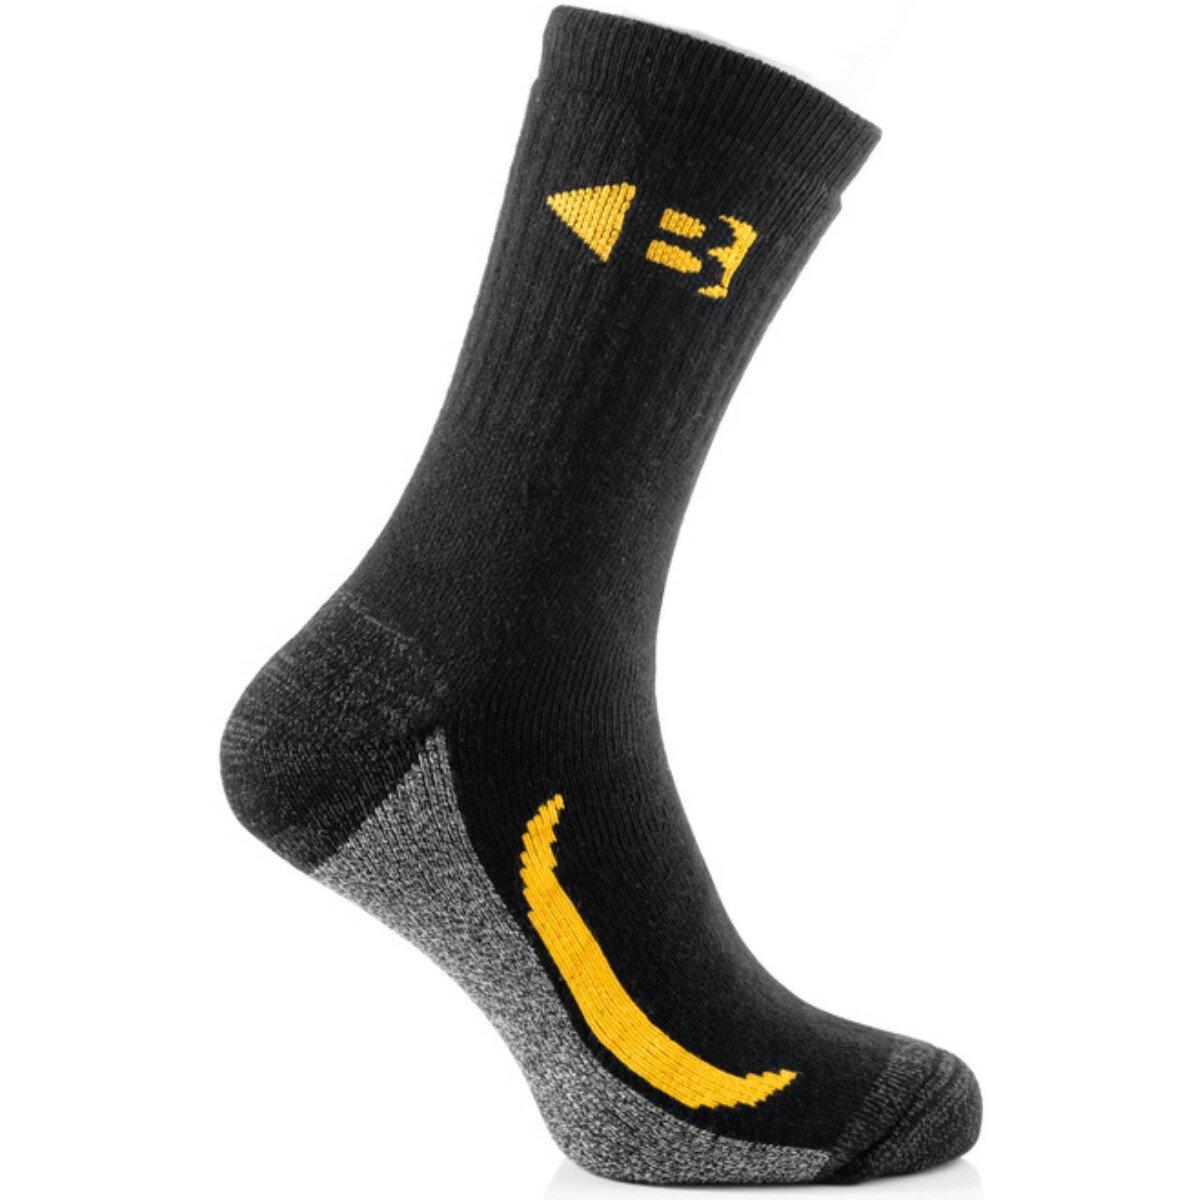 Buckbootz ZBSOKZCORDURABK Cordura Socks Pack of 6 Black